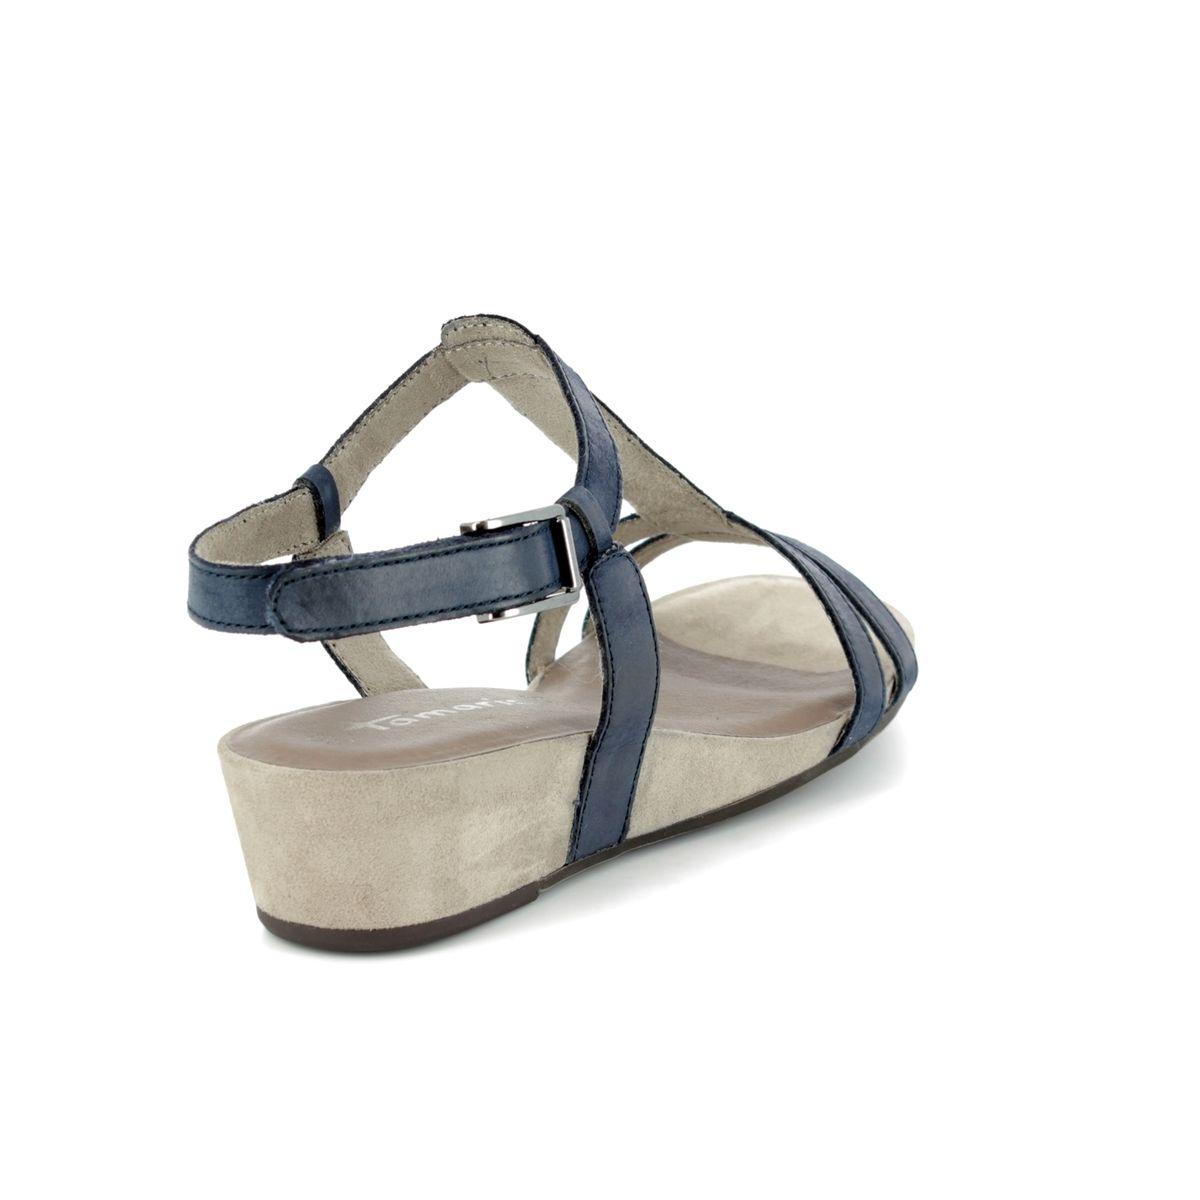 23150d588fde Tamaris Wedge Sandals - Navy nubuck - 28209 20 773 EMILY 81